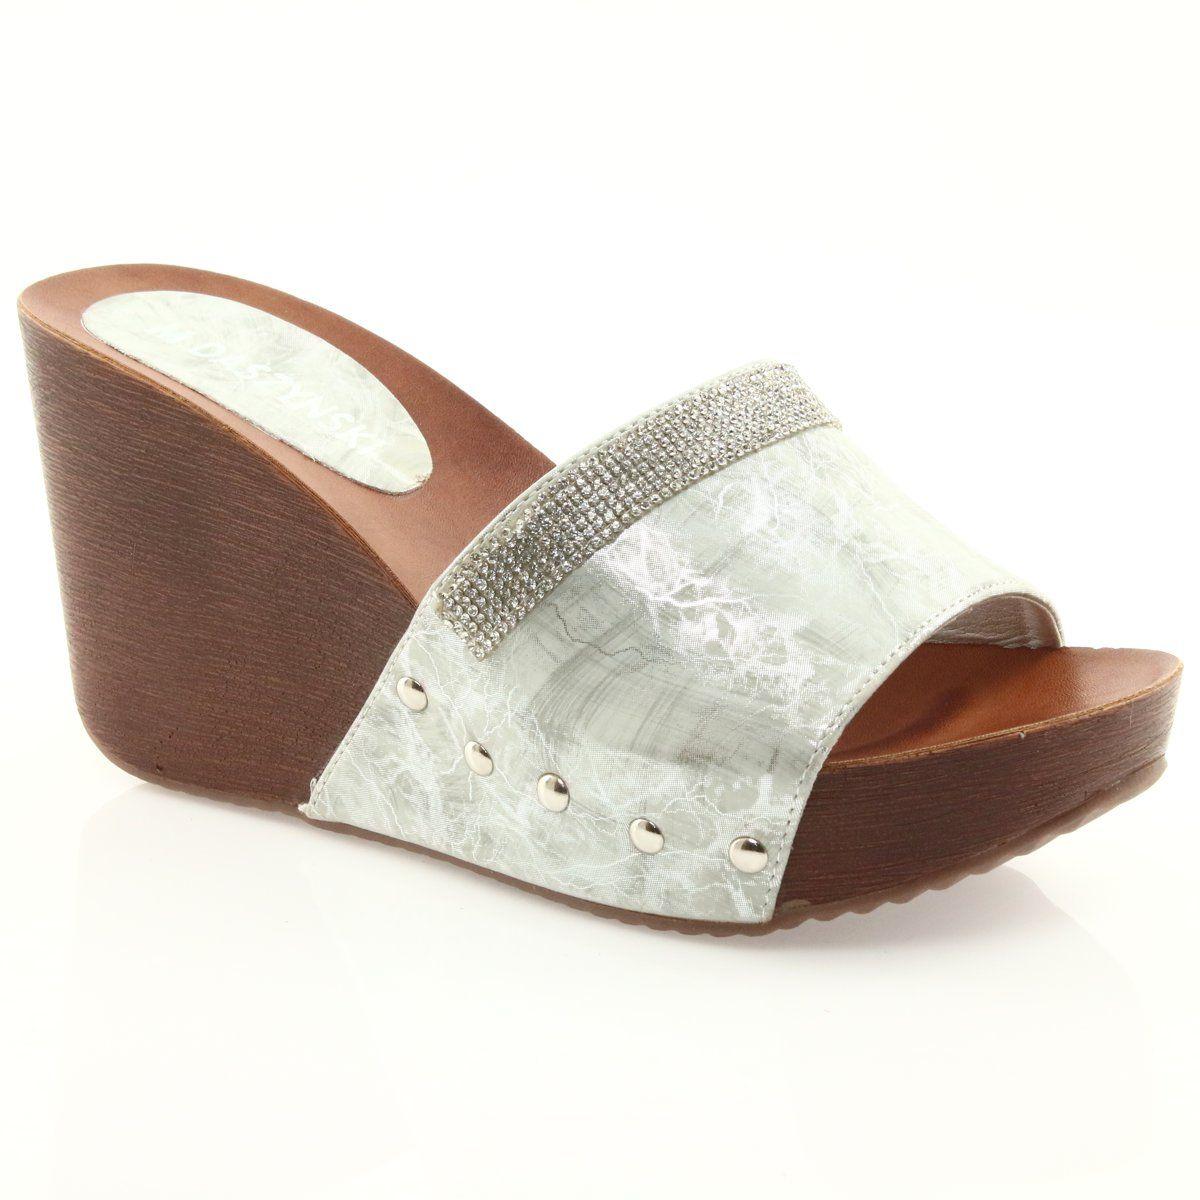 Klapki Na Koturnie Daszynski Am43 Z Cyrkoniami Szare Slip On Sandal Shoes Sandal Espadrille